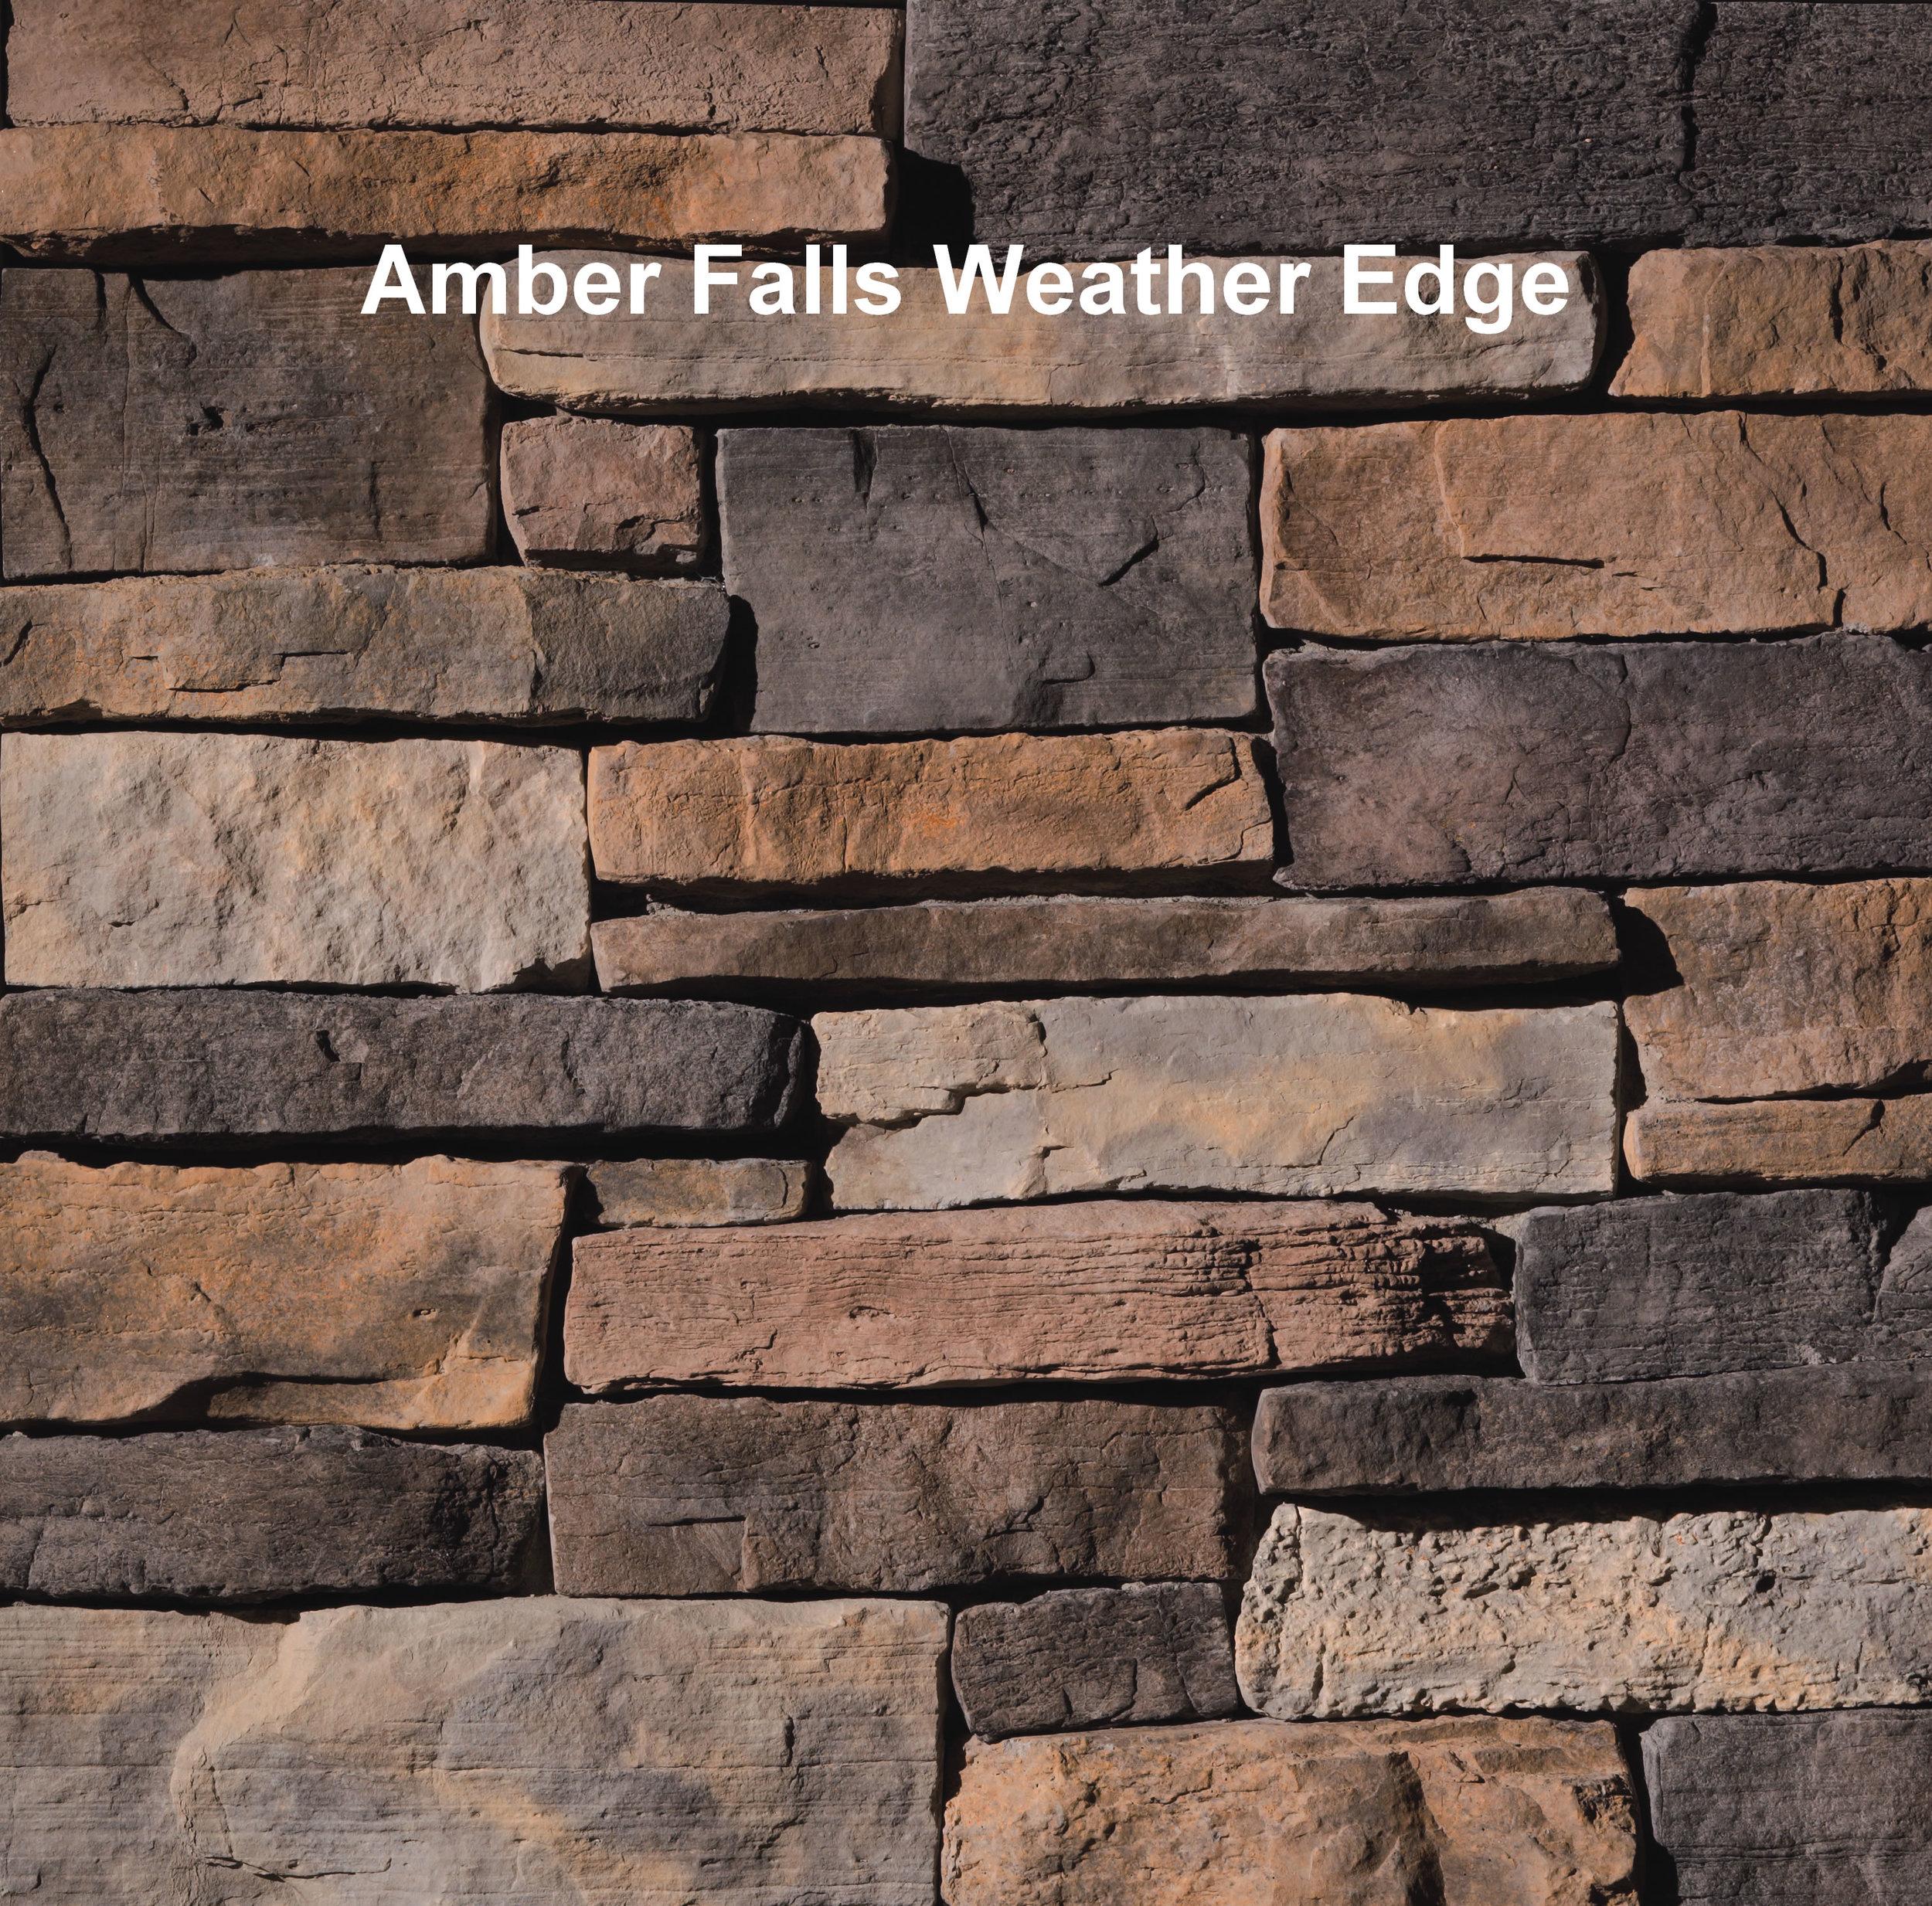 ES_Weather Edge_Amber Falls_profile_east.jpg